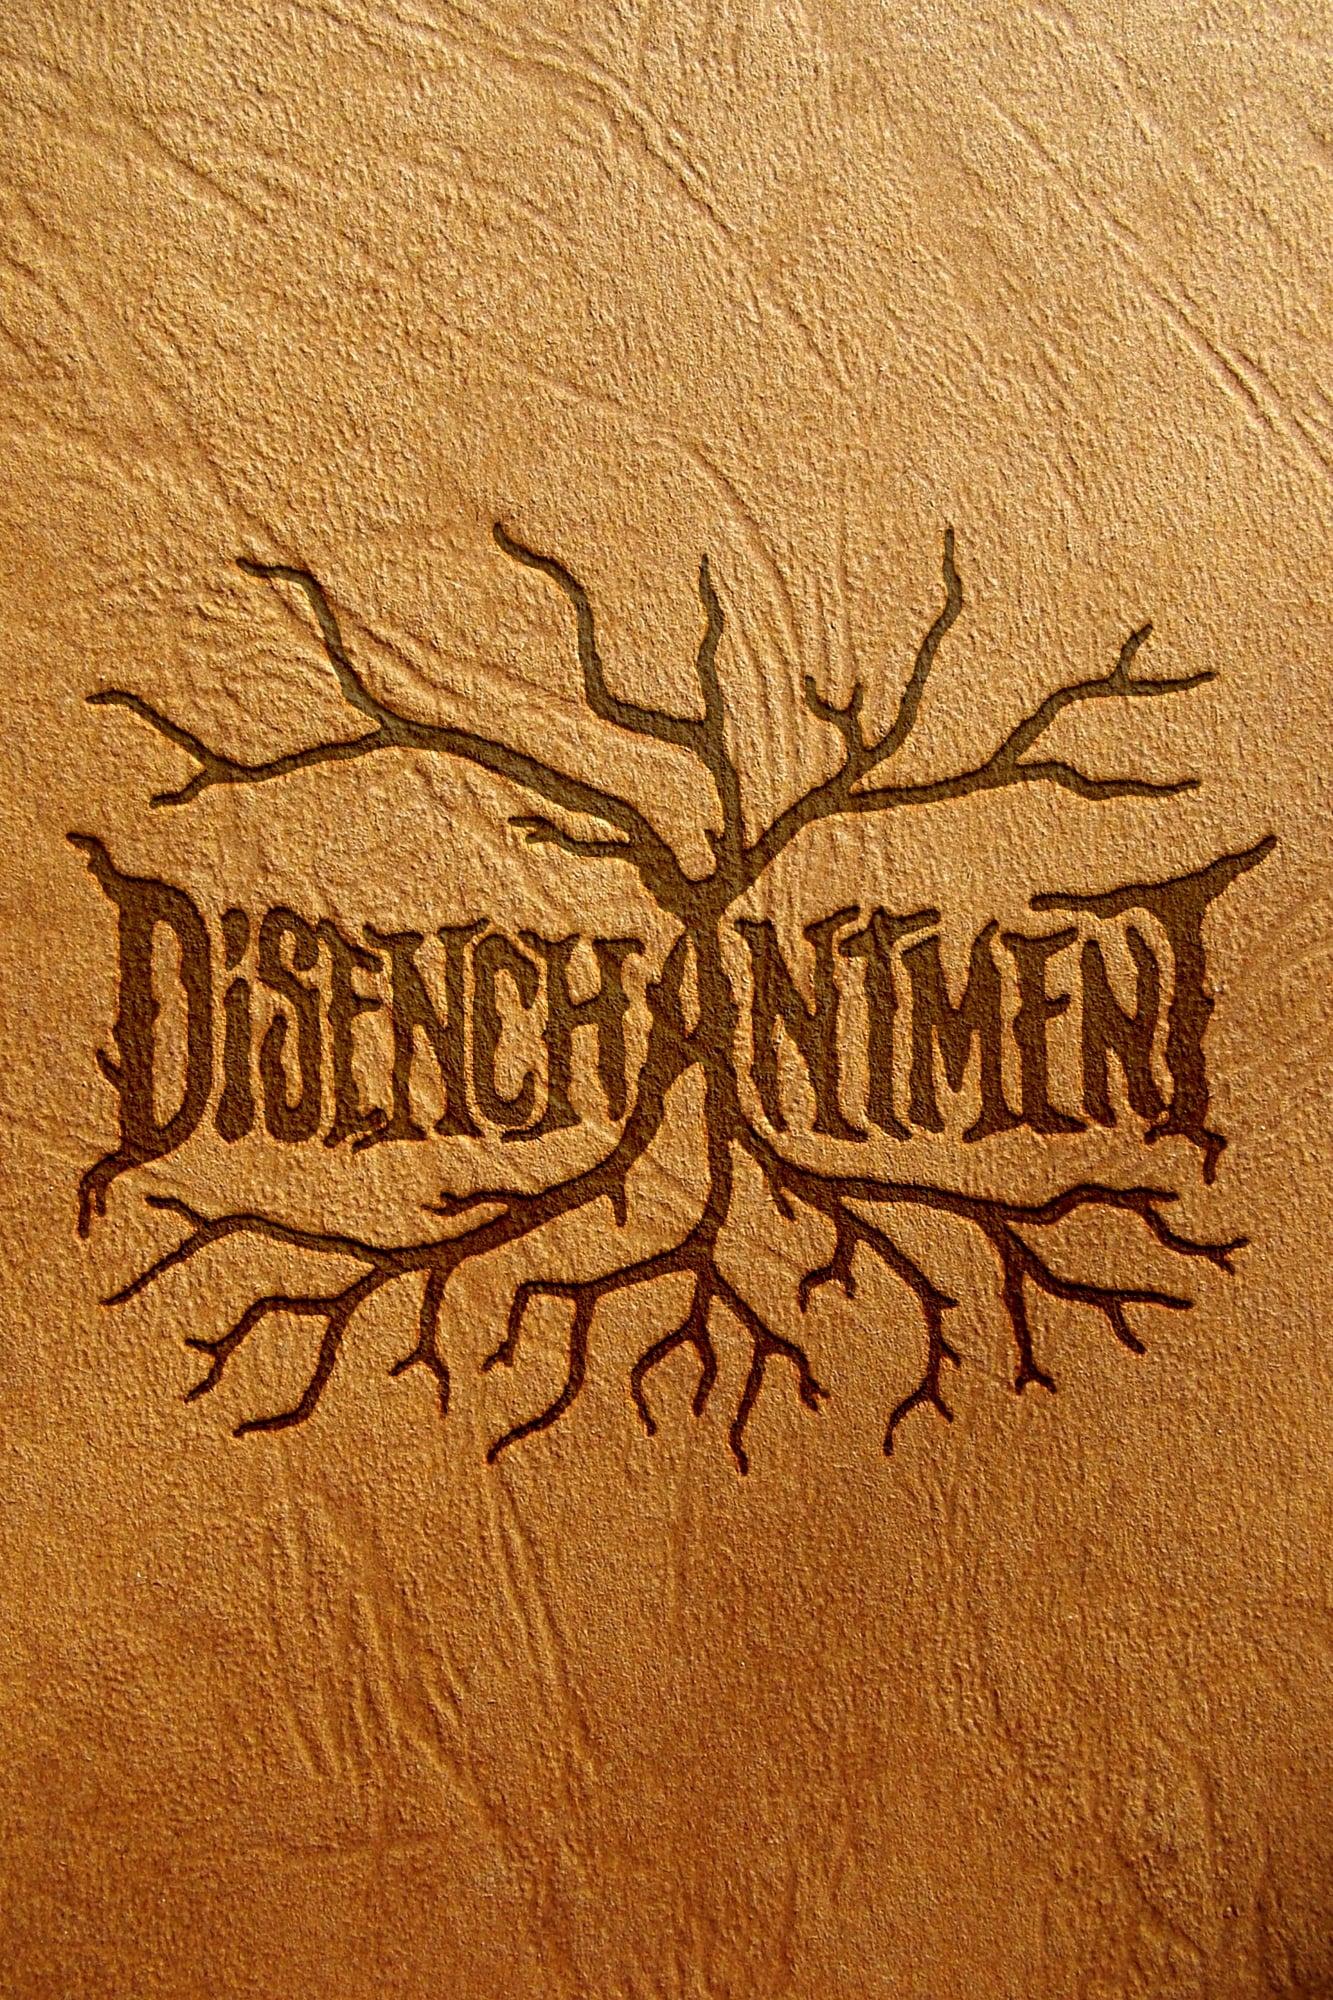 disenchantment - 396×594